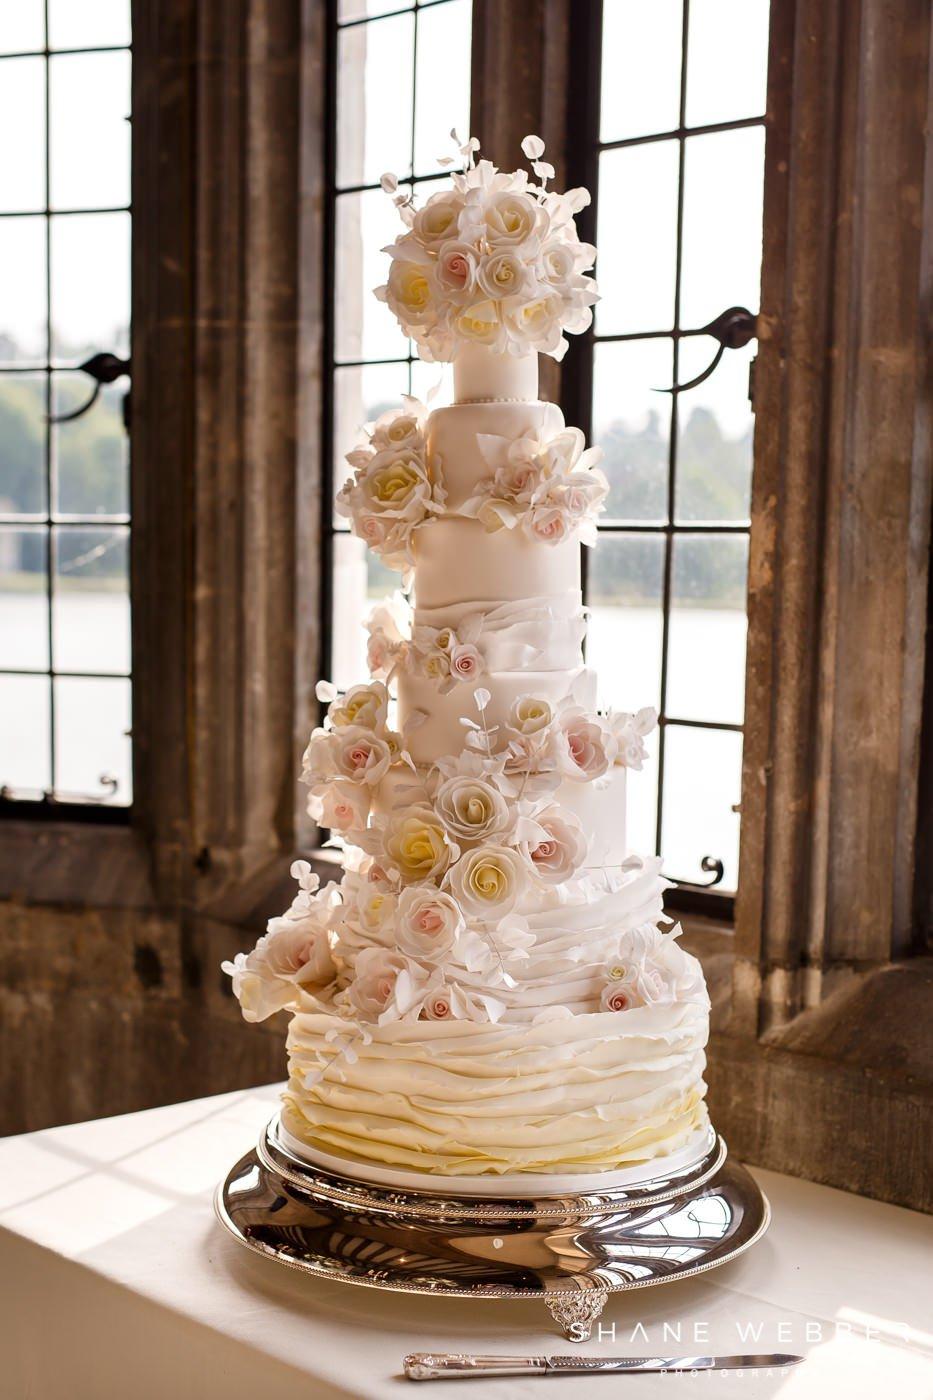 Allerton Castle cake